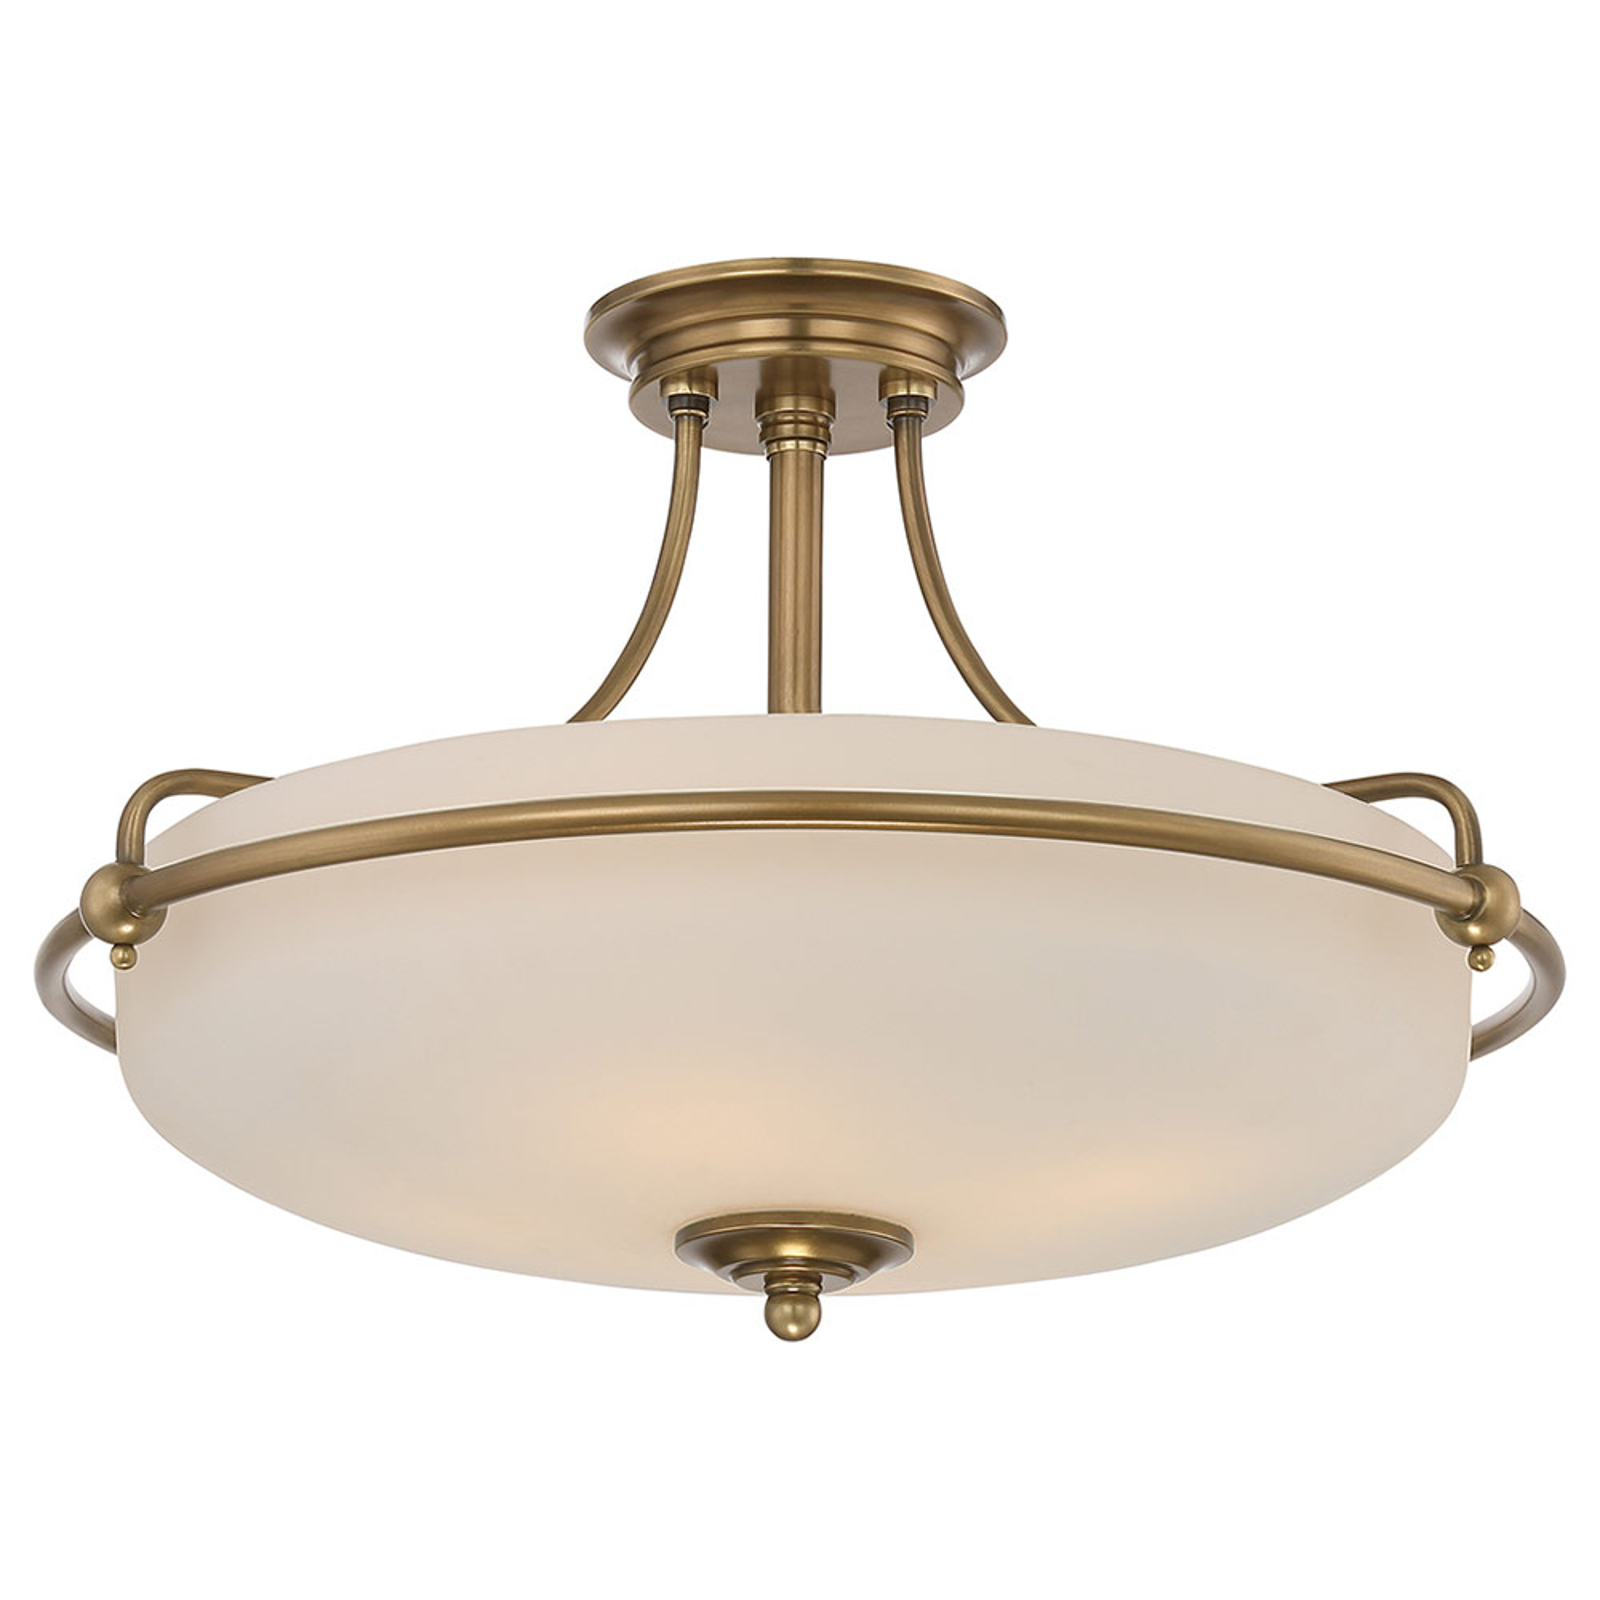 Plafondlamp Griffin met afstand, messing, Ø 53 cm